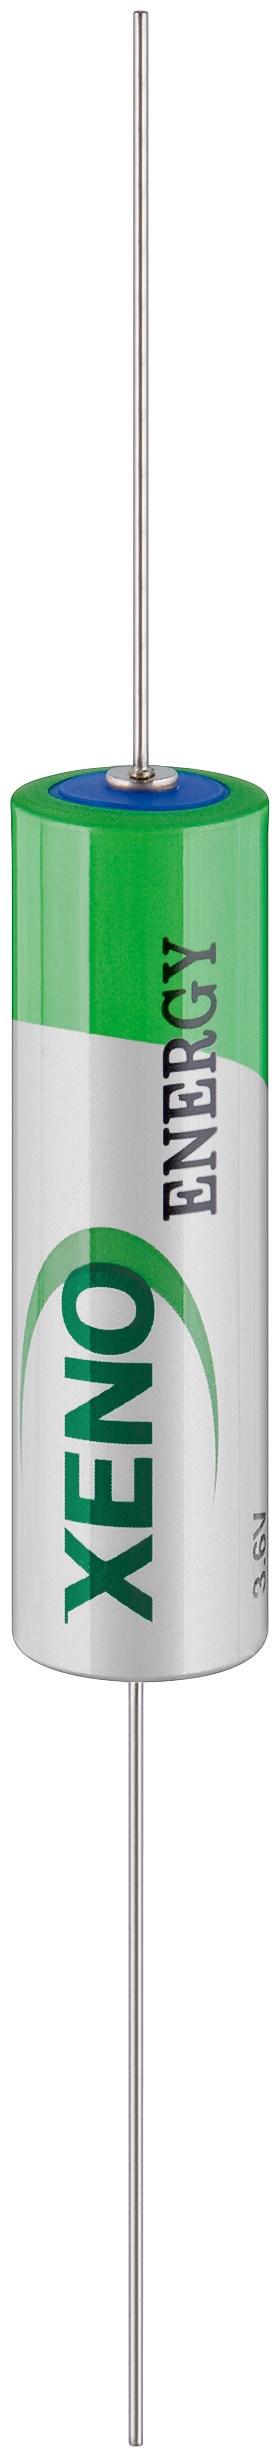 Batteria litio cloride AA (Mignon)/CR14505/XL-060F/AX - 2400 mAh-0